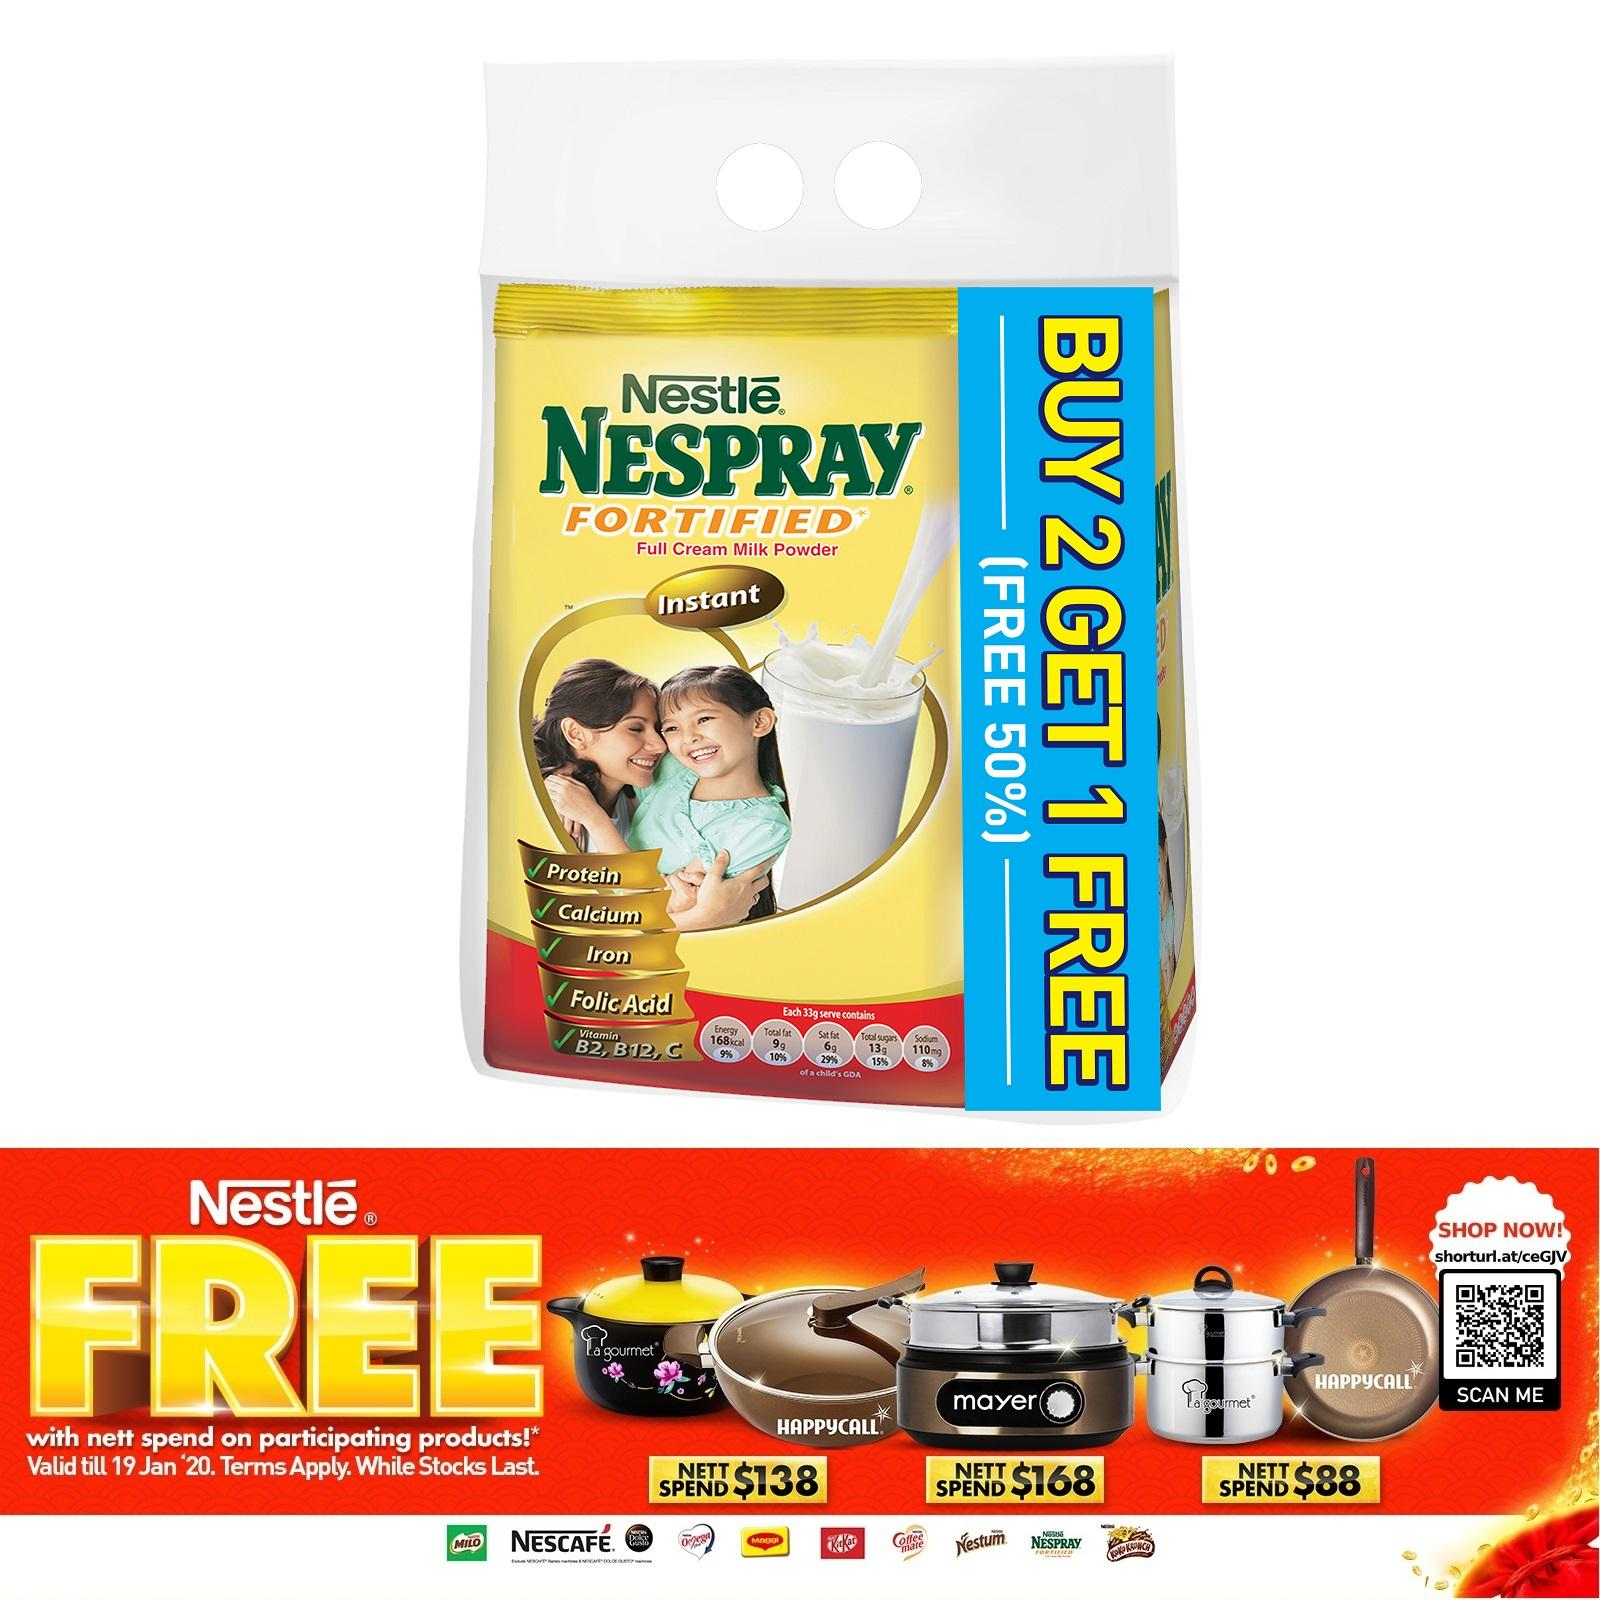 NESPRAY Instant Fortified Full Cream Milk Powder (2 Packs Free 1 Pack)